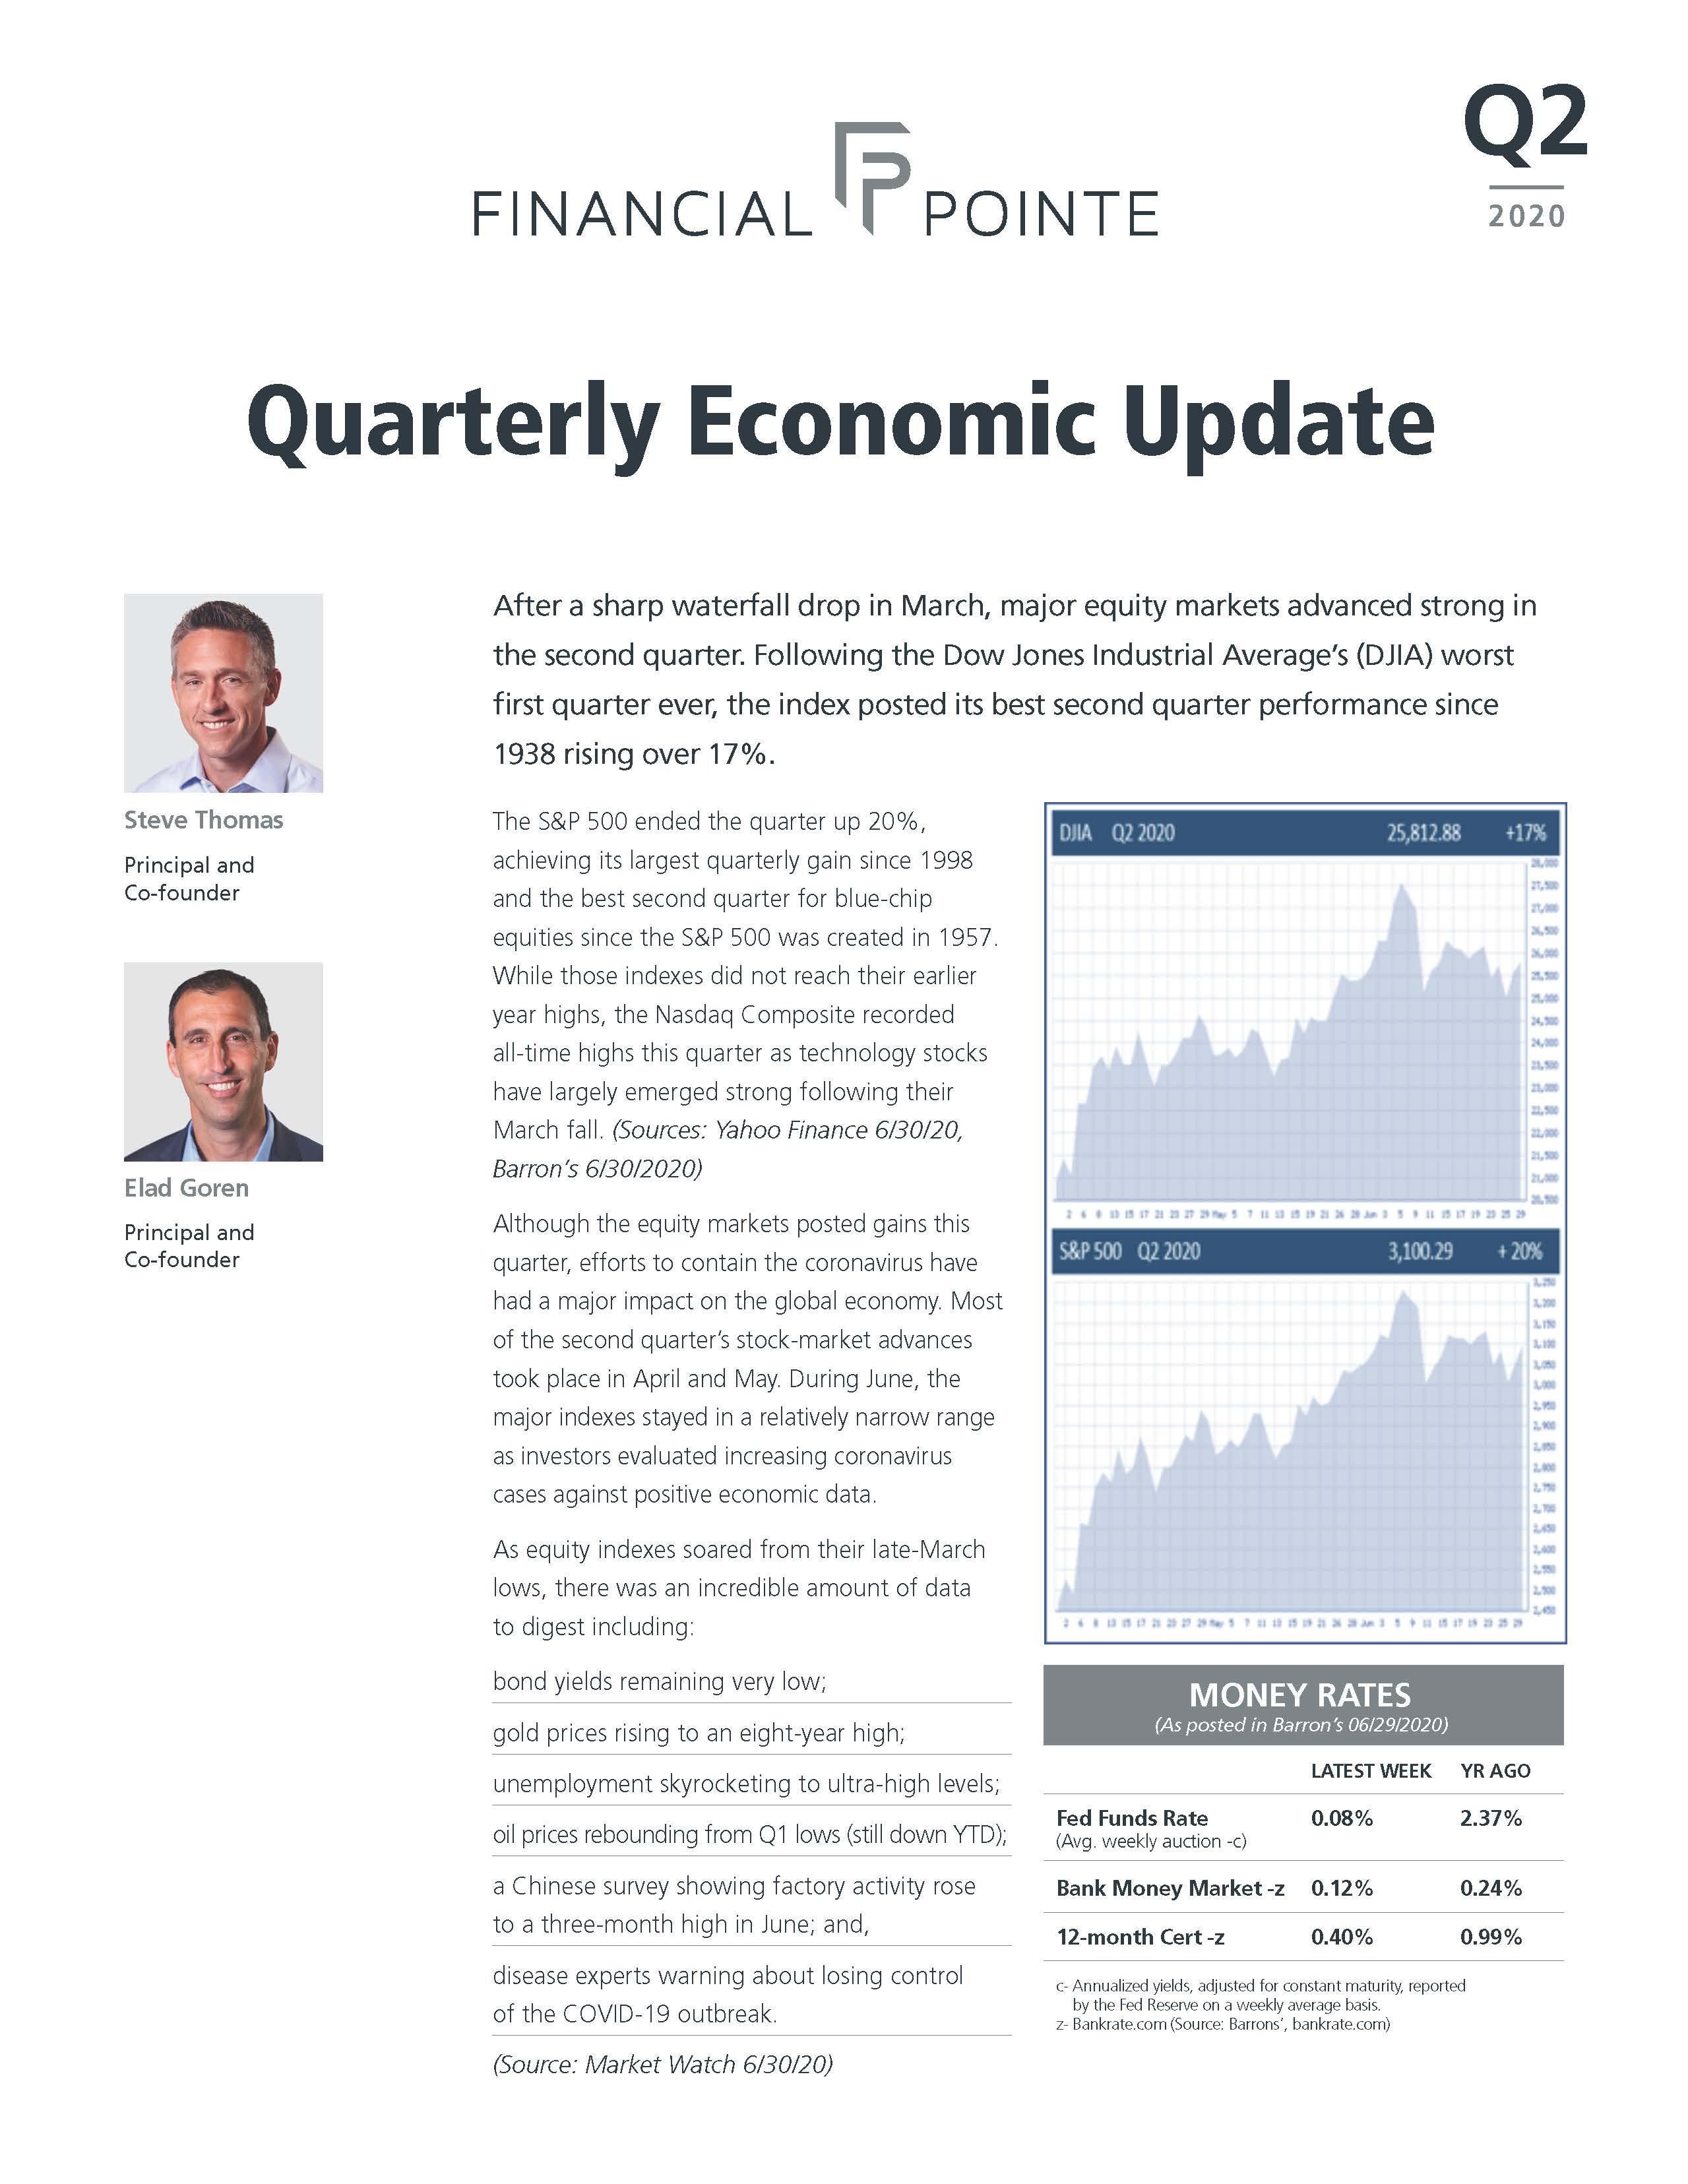 Quarterly Economic Update - Q2 2020 Thumbnail